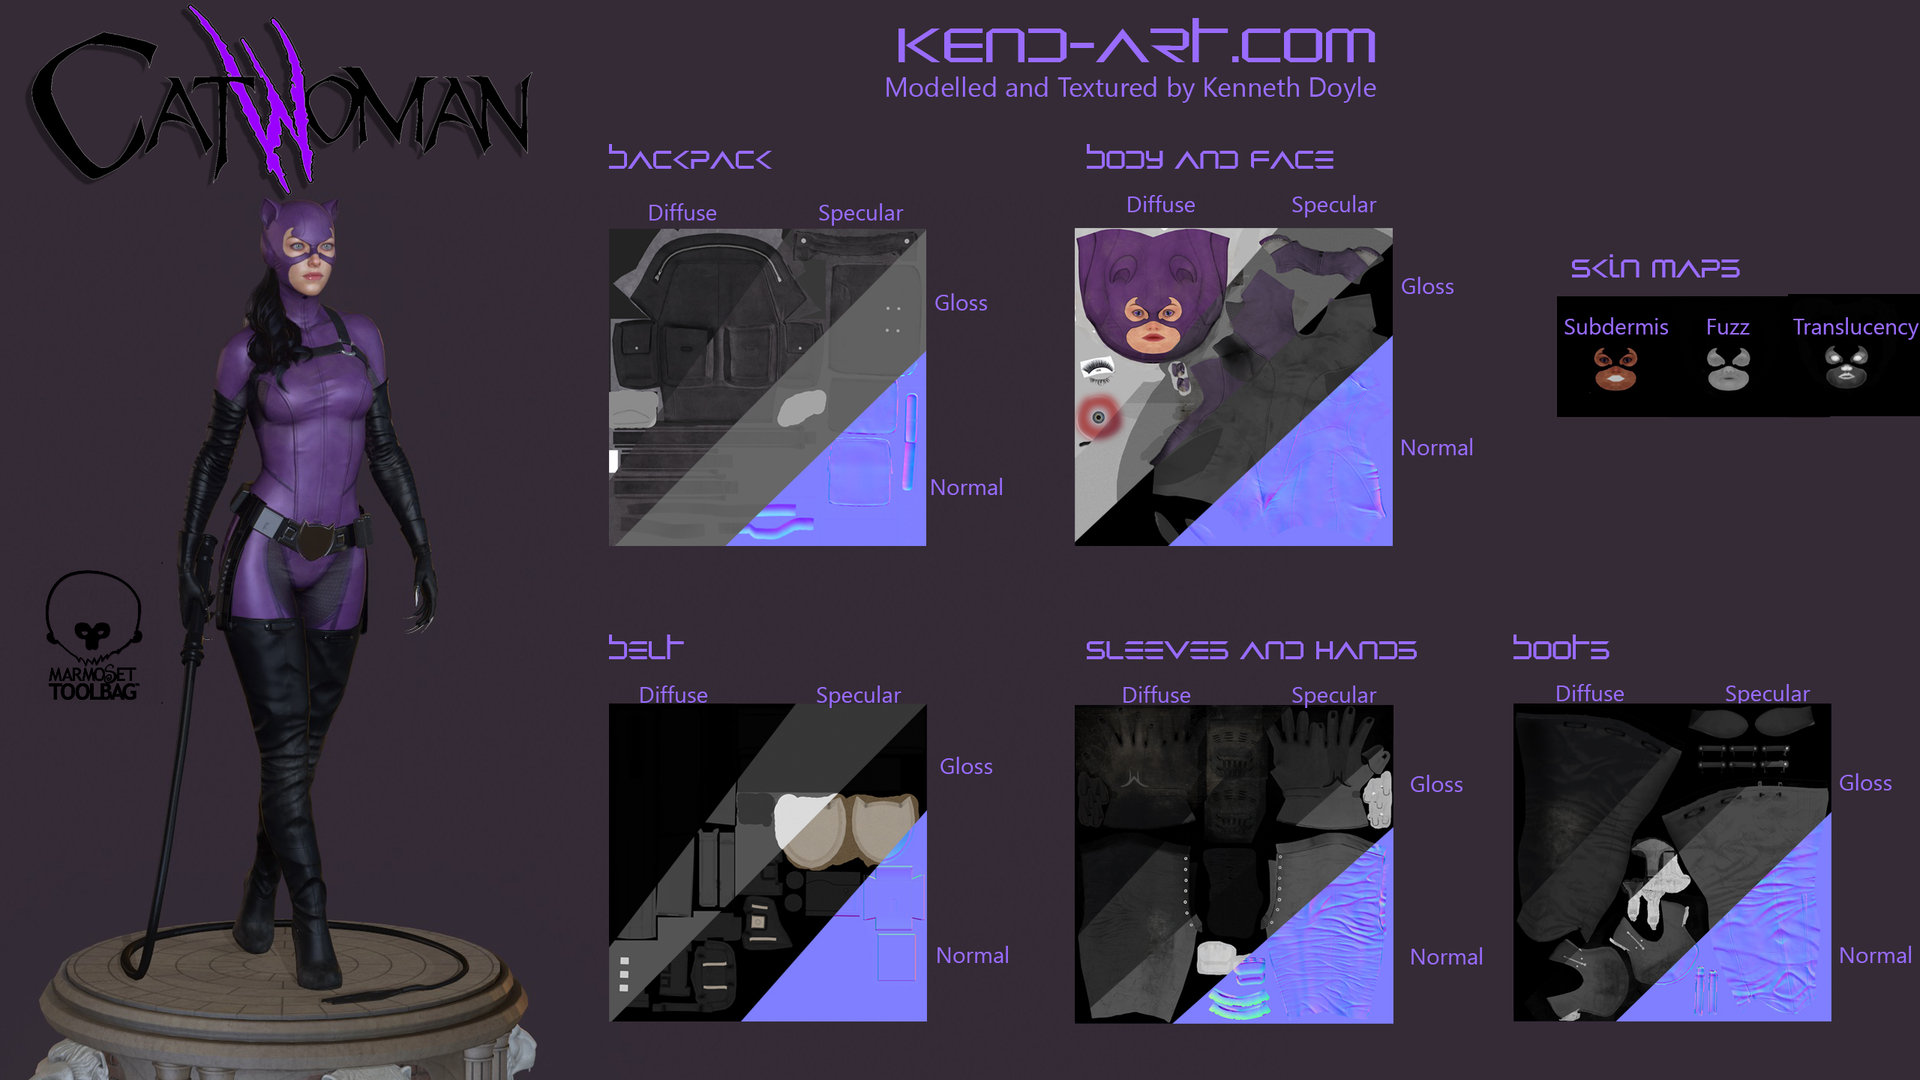 Kenneth doyle catwoman8